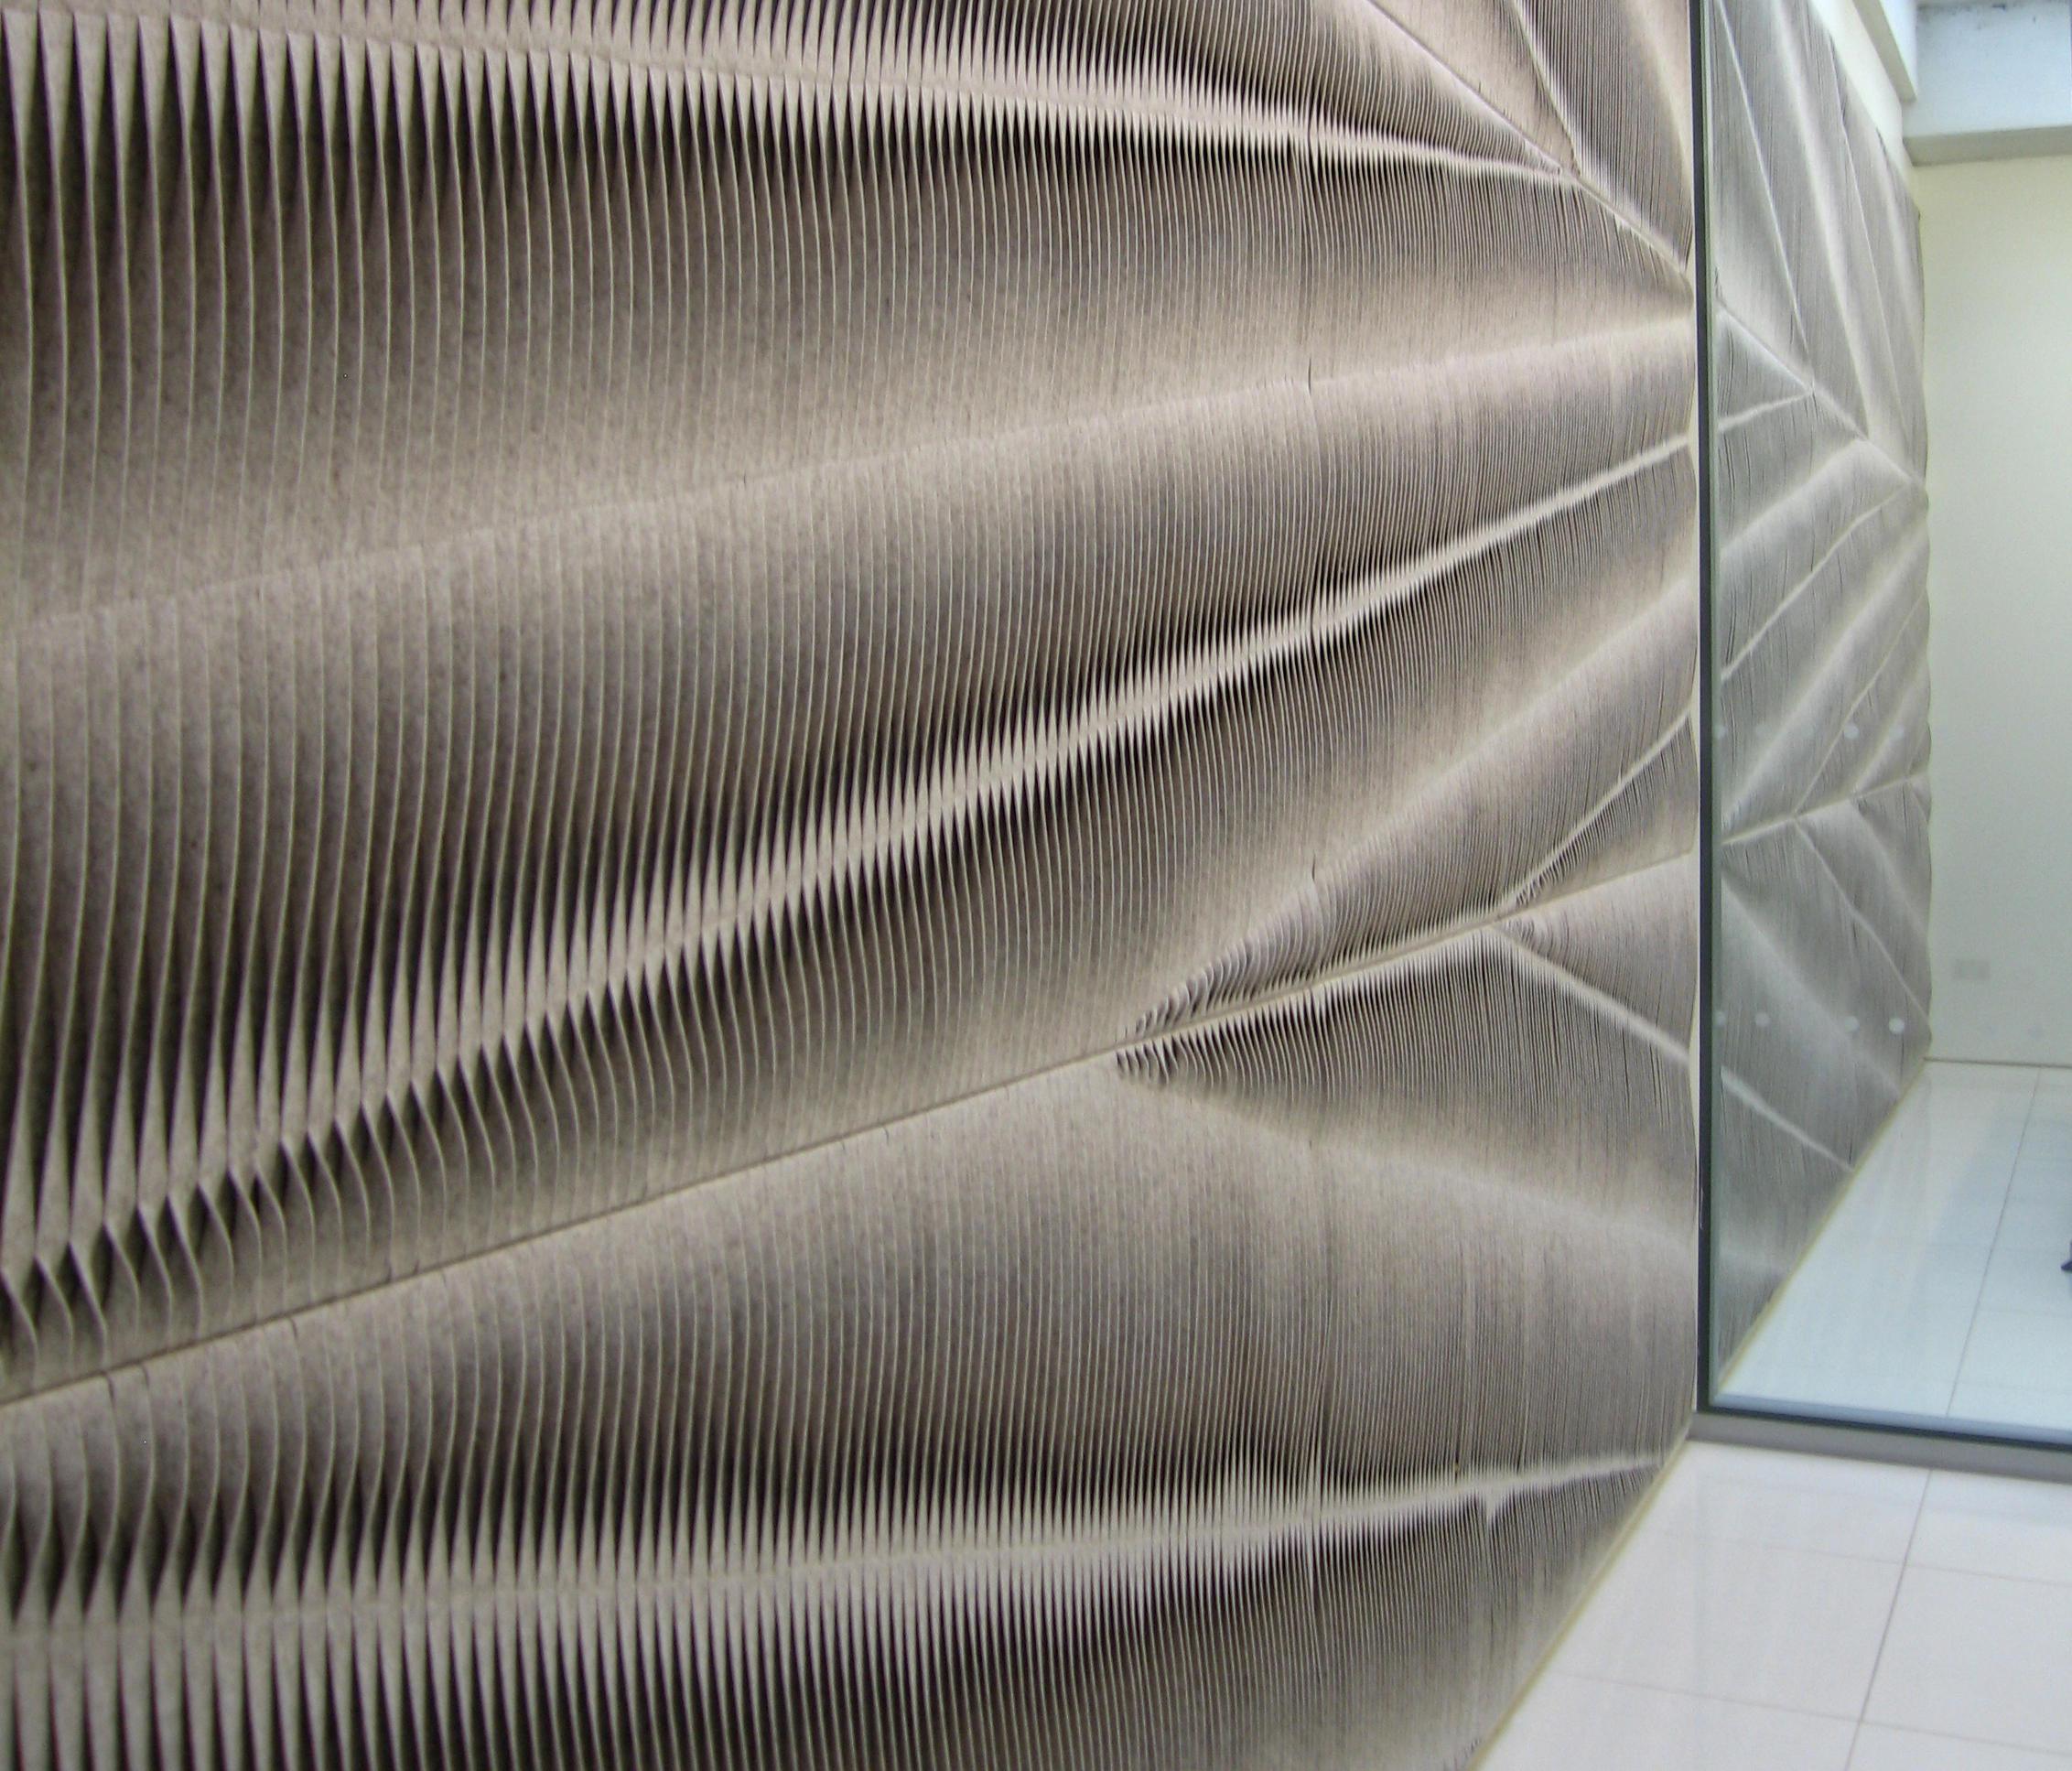 Wall Fabrics Product : Leaf wall panel bespoke fabrics from anne kyyrÖ quinn